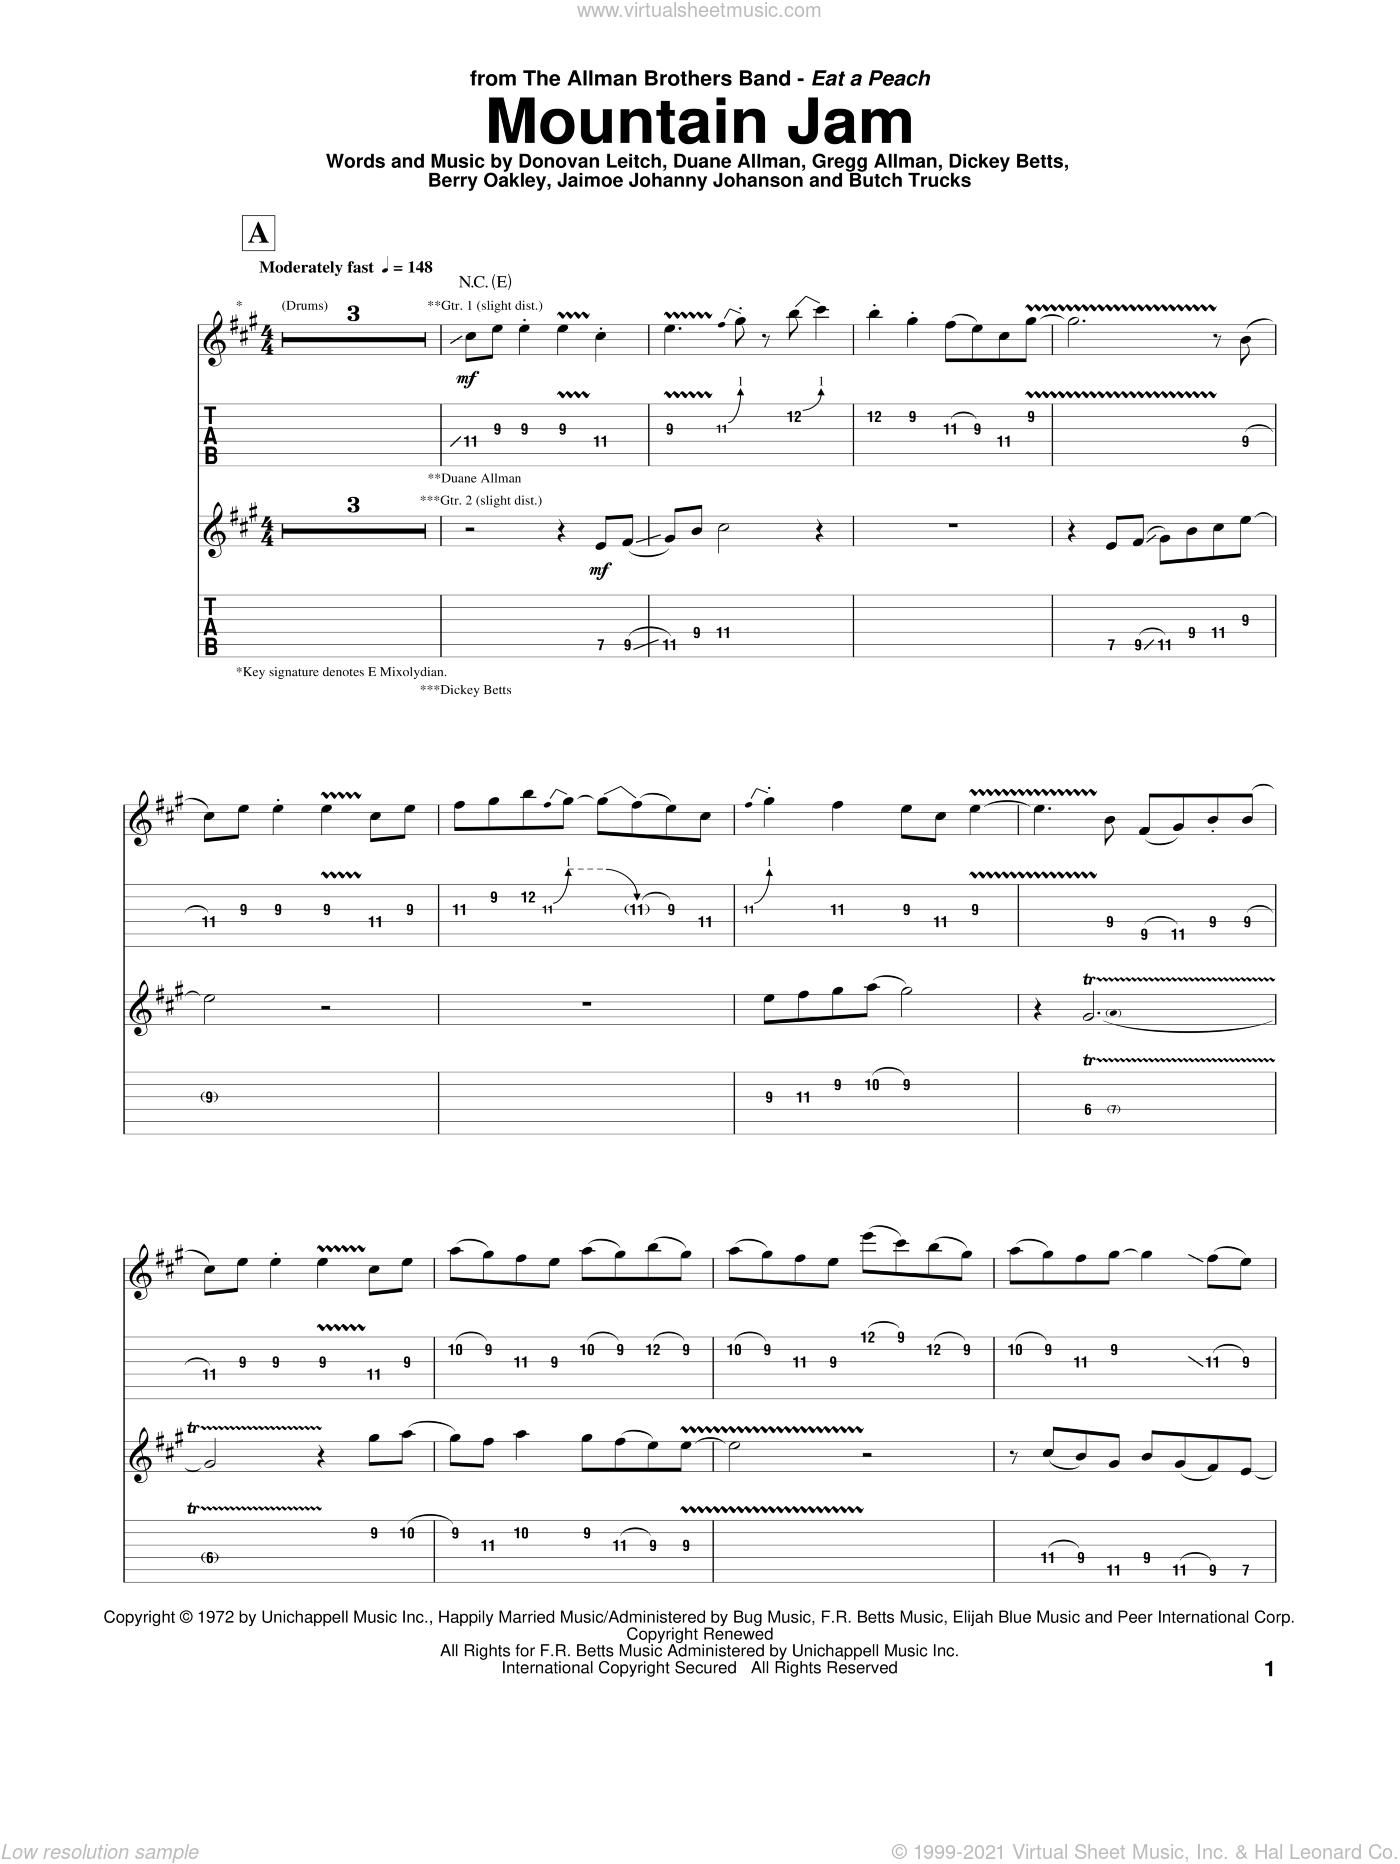 Mountain Jam sheet music for guitar (tablature) by Allman Brothers Band, The Allman Brothers Band, Berry Oakley, Butch Trucks, Dickey Betts, Donovan Leitch, Duane Allman, Gregg Allman and Jaimoe Johanny Johanson, intermediate skill level